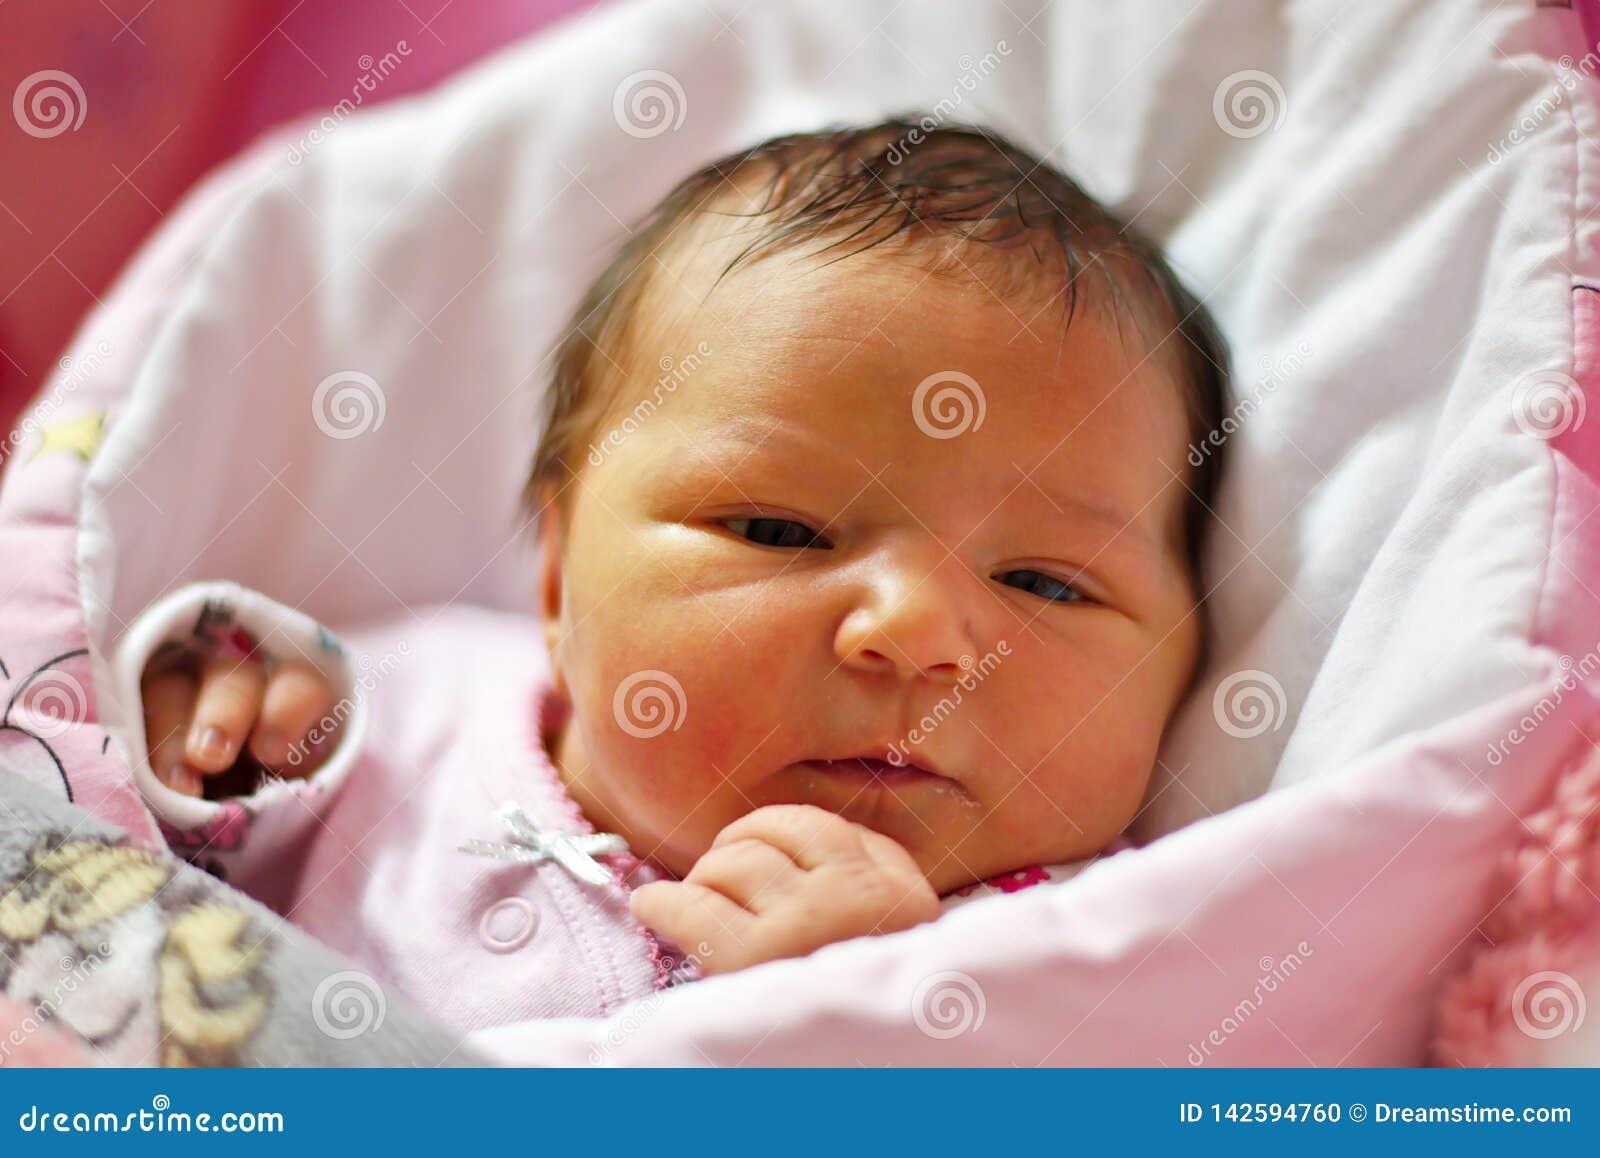 Pretty Black Hair Newborn Baby Girl Stock Photo Image Of Hair Woman 142594760